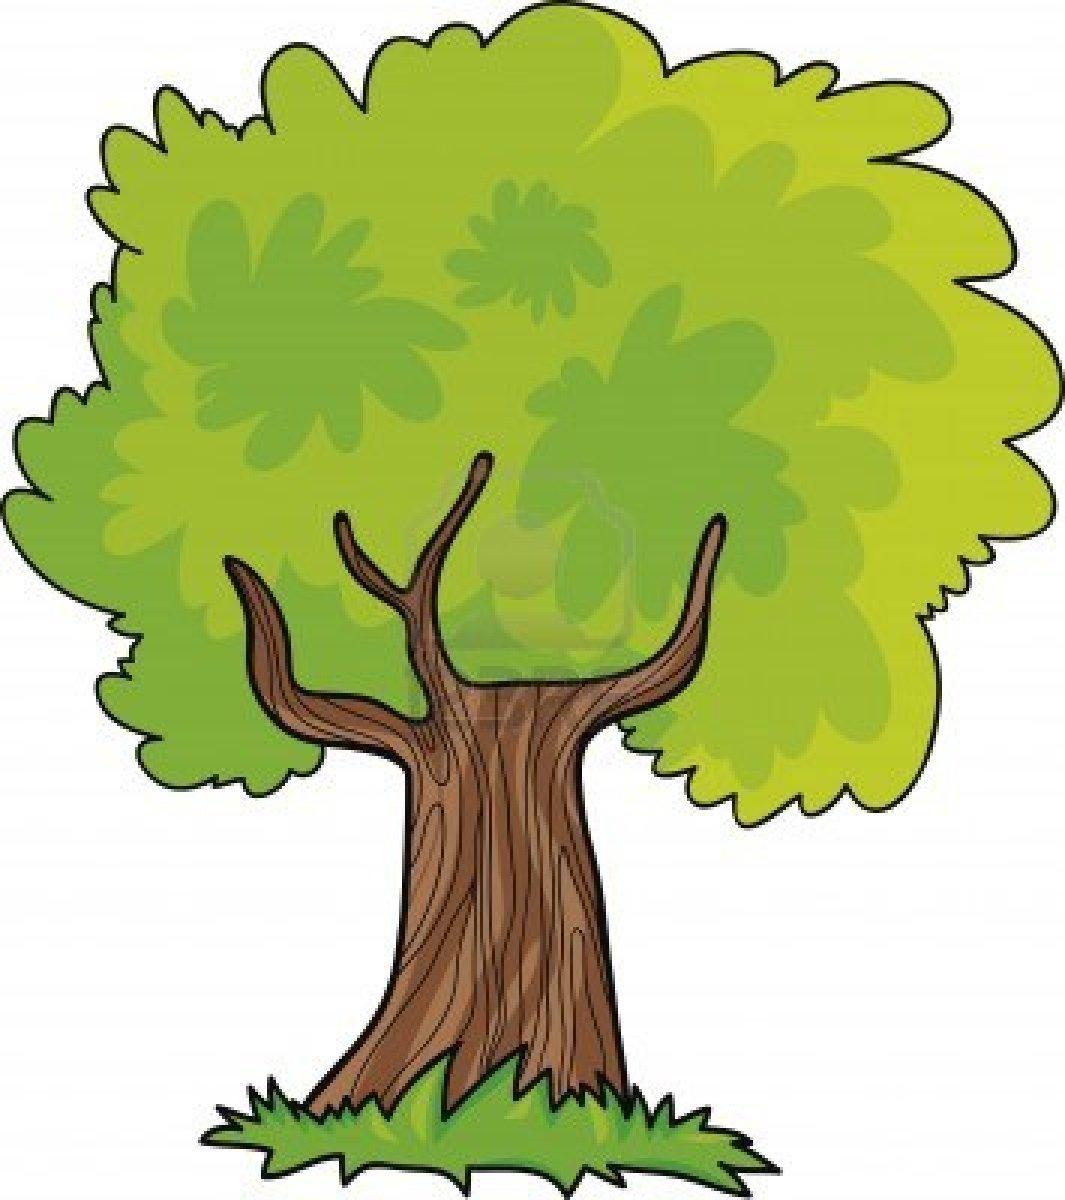 Tree Cartoon Clipart - Clipart Kid